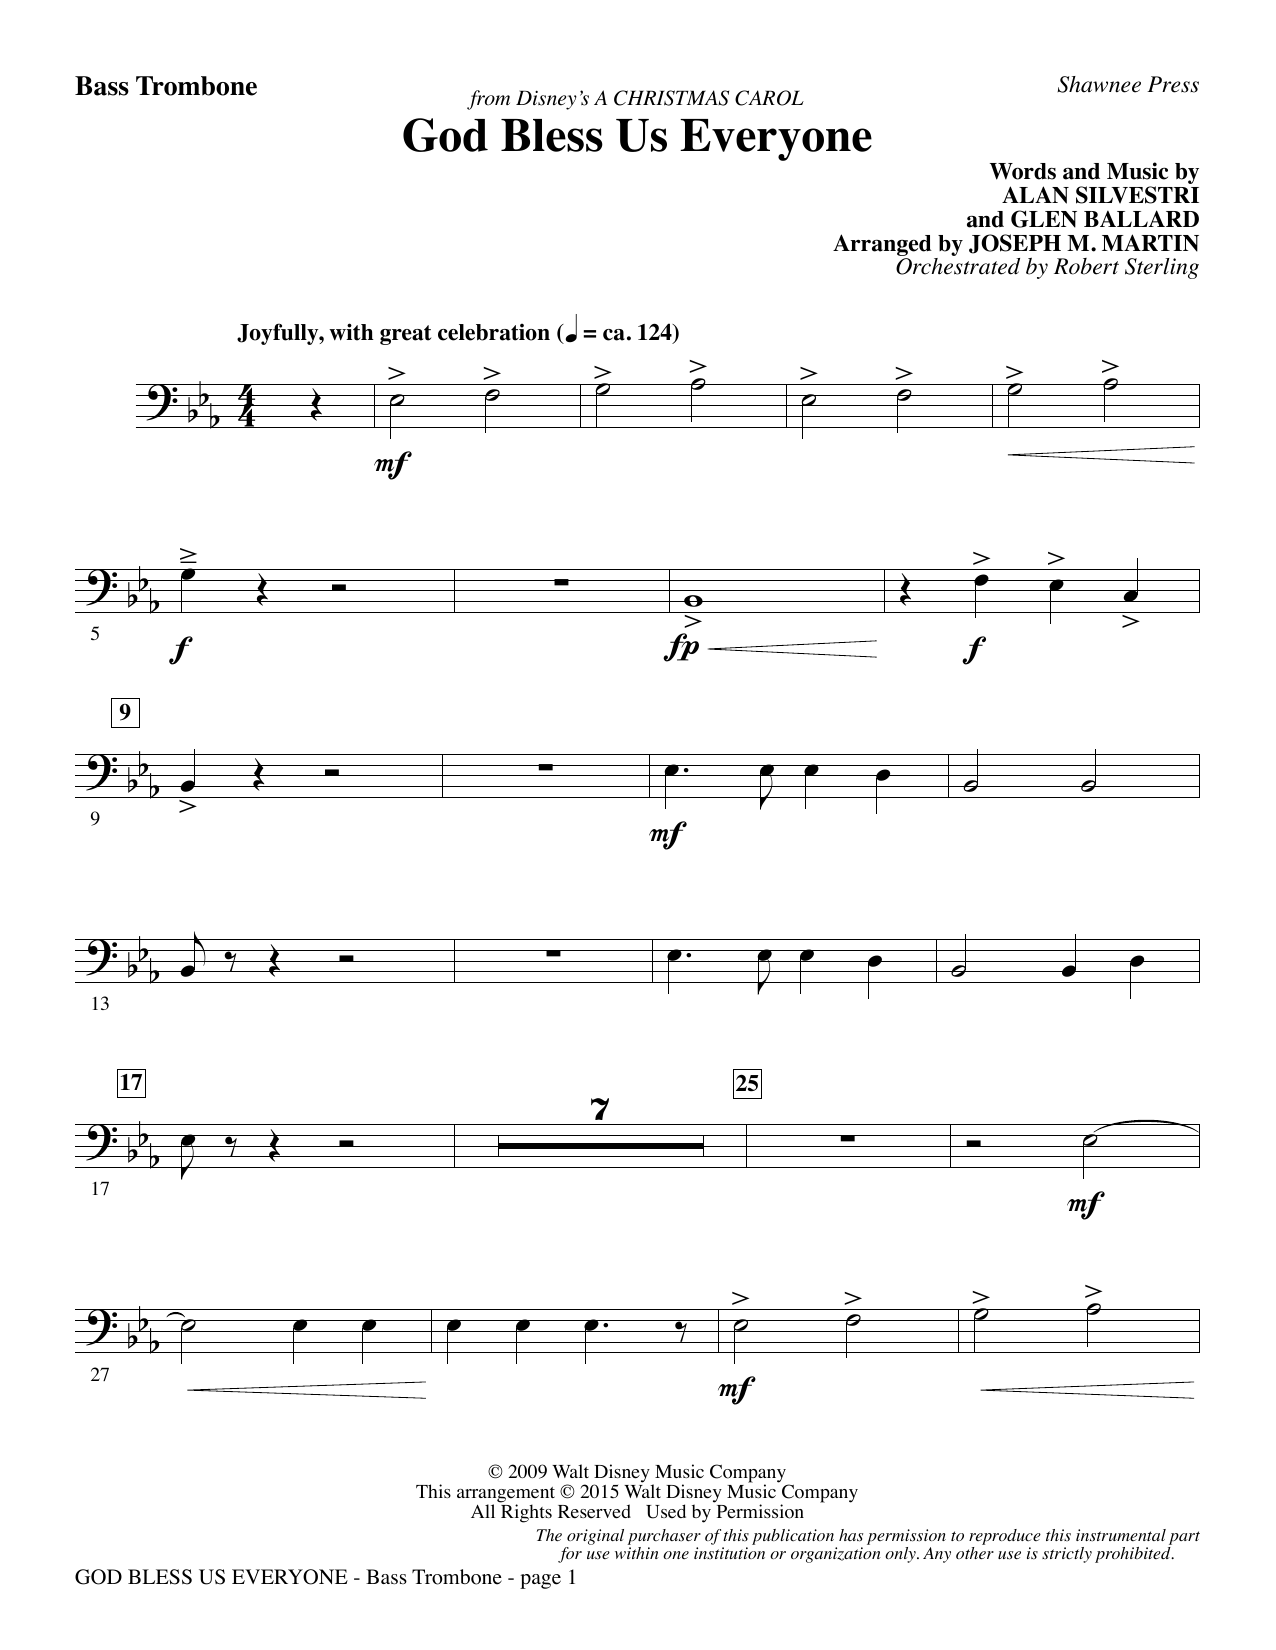 God Bless Us Everyone (from Disney's A Christmas Carol) - Bass Trombone sheet music